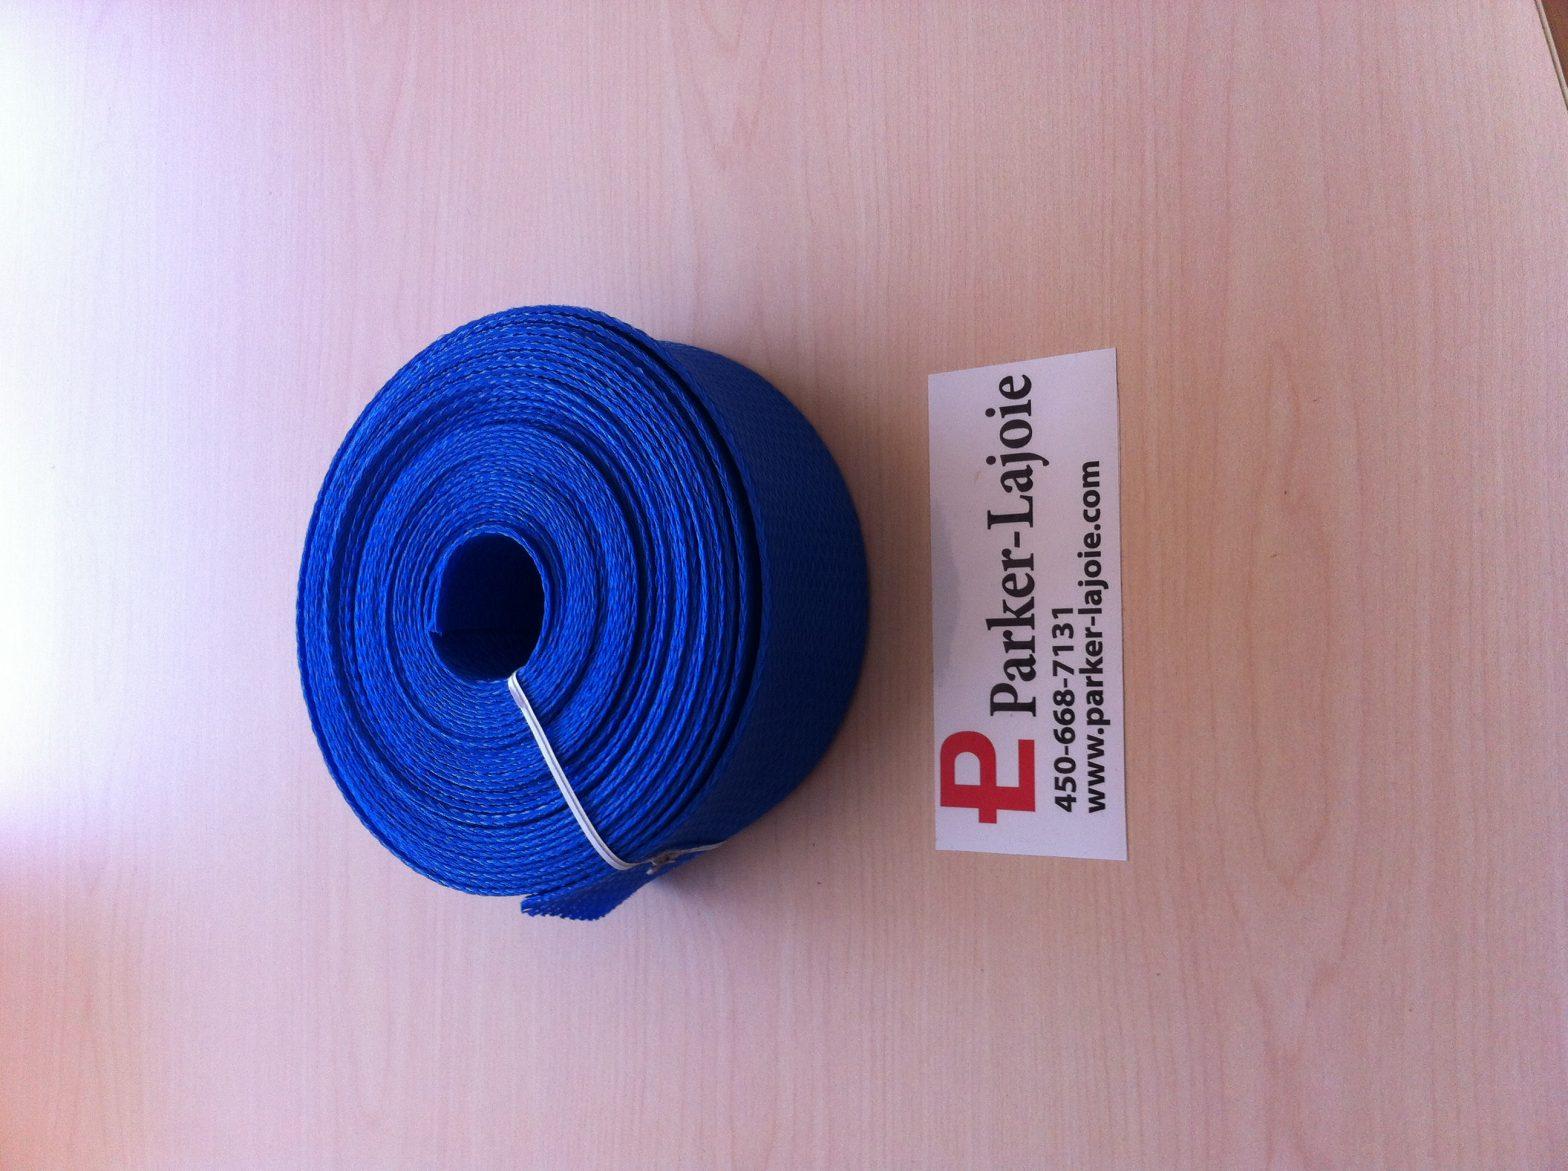 Gaine protectrice en polyester de 50'-0